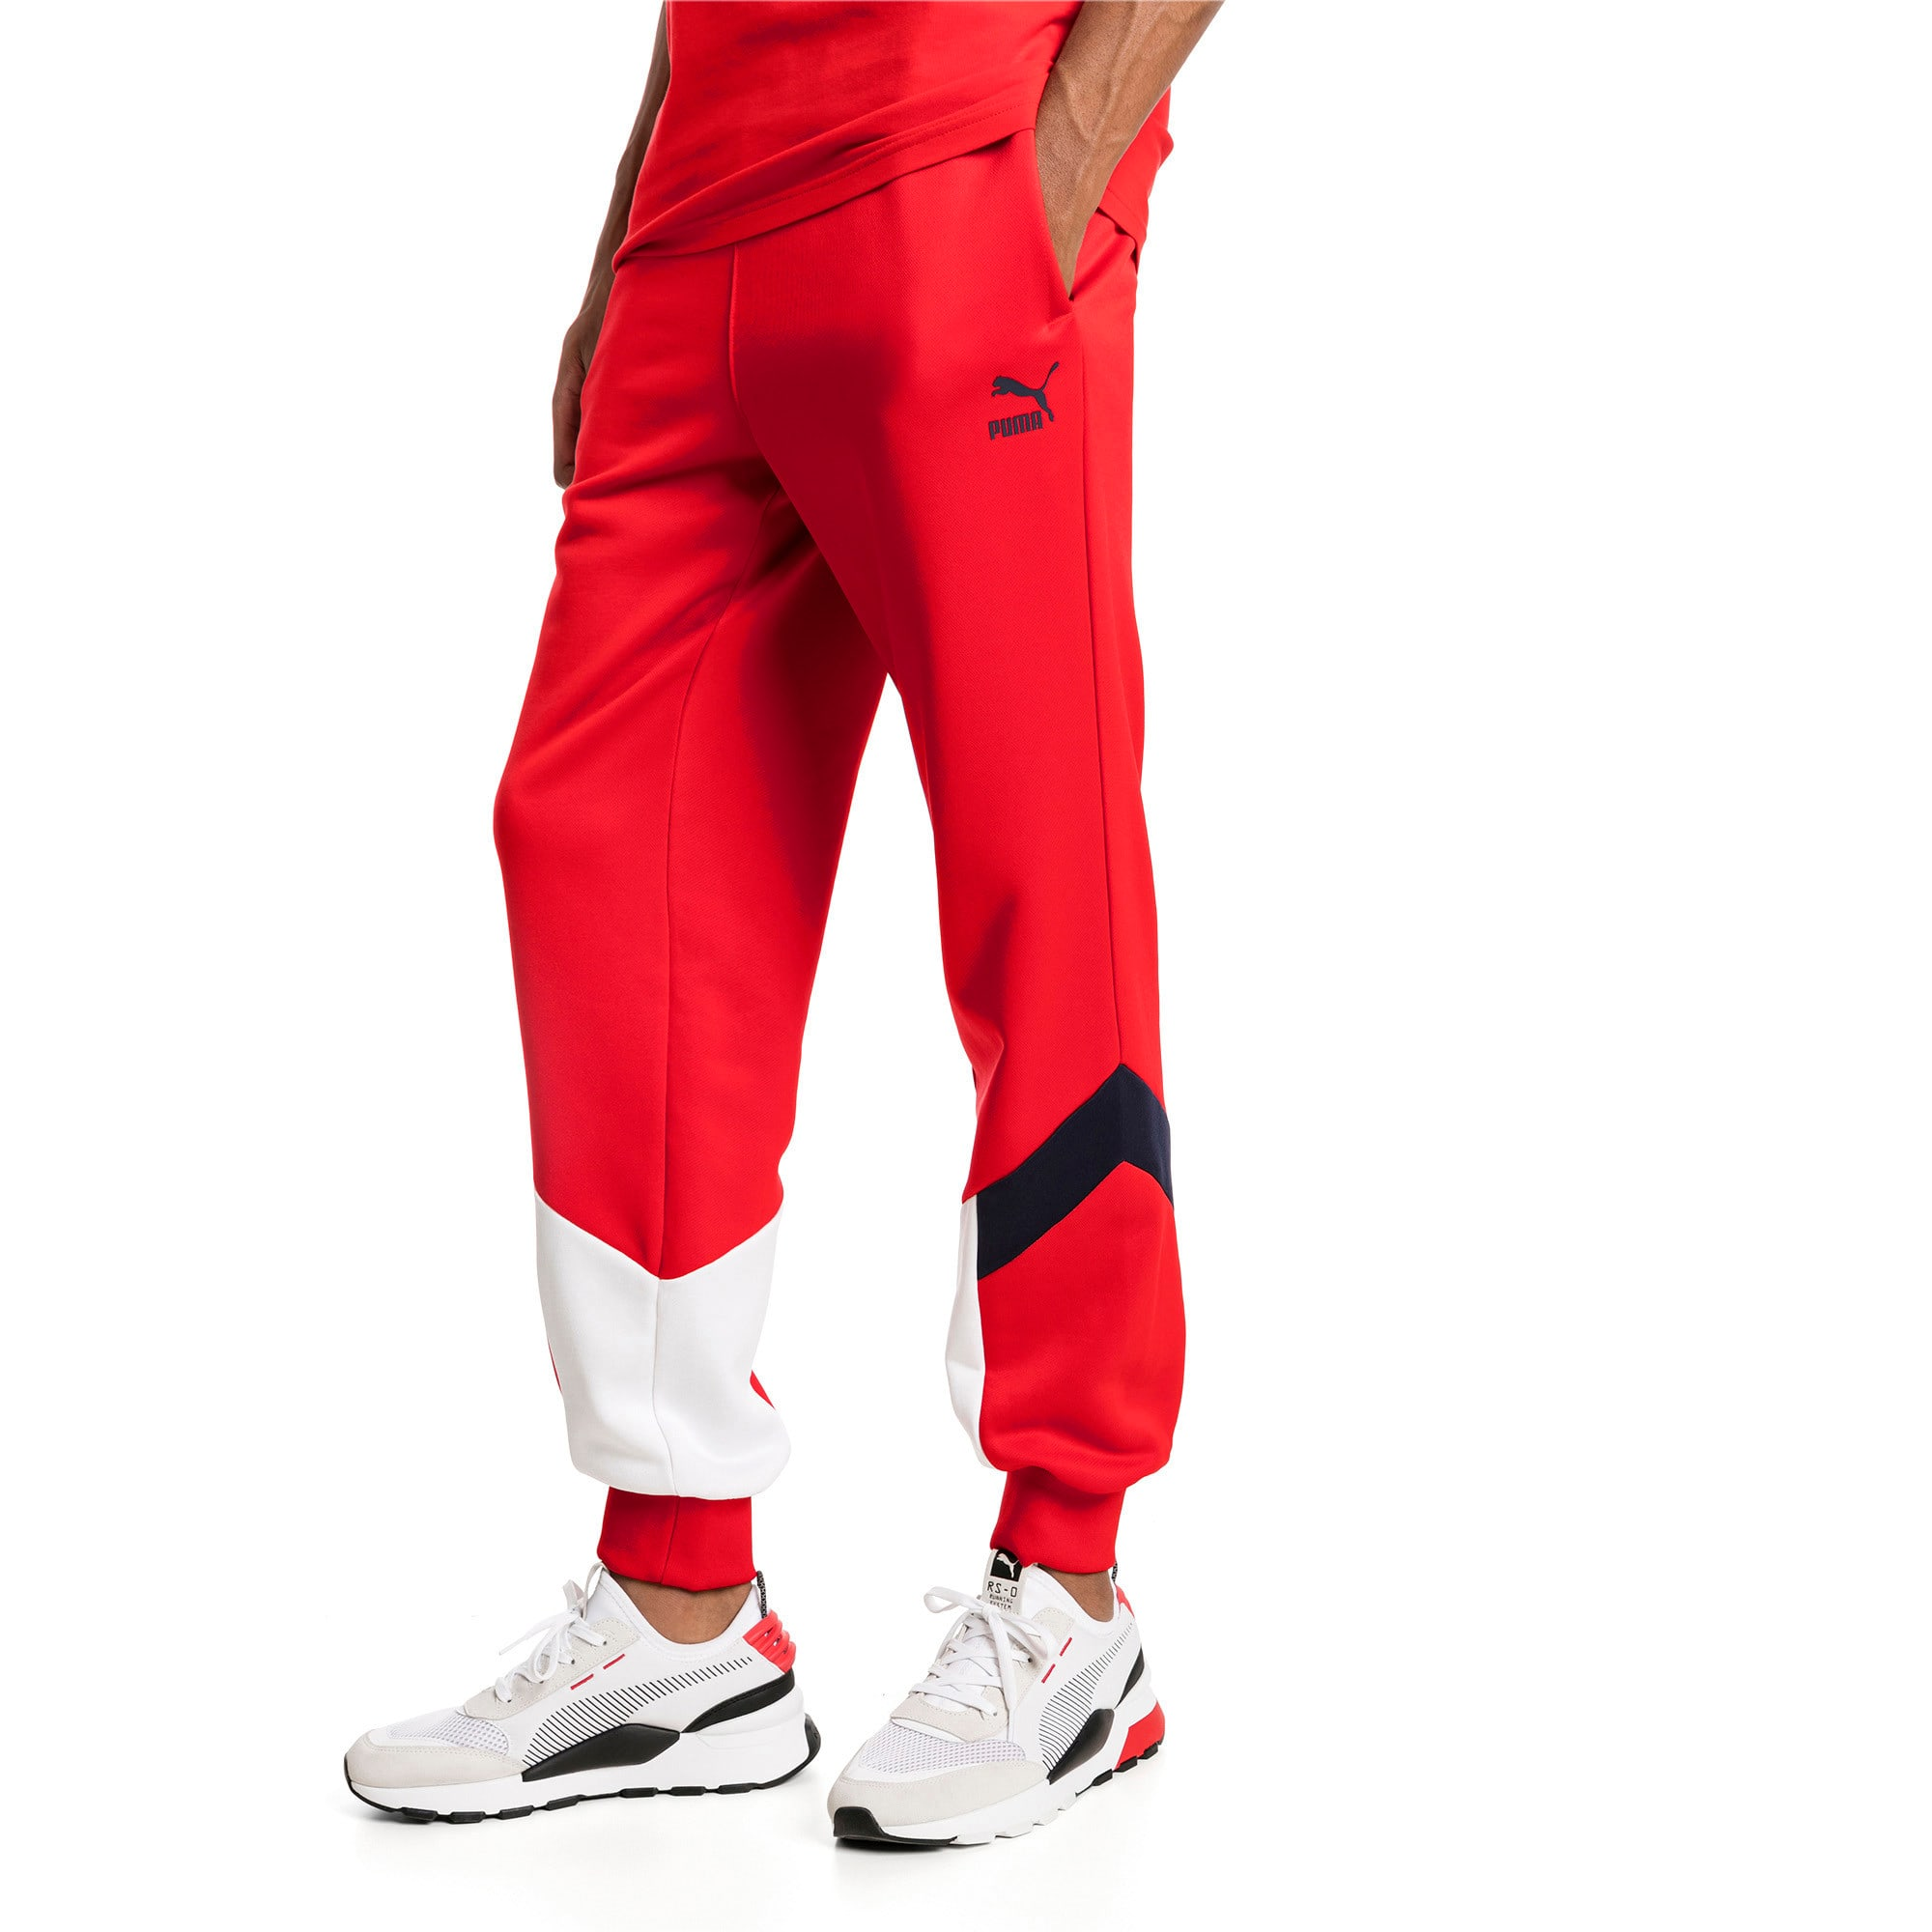 Thumbnail 2 of Iconic MCS Men's Track Pants, High Risk Red, medium